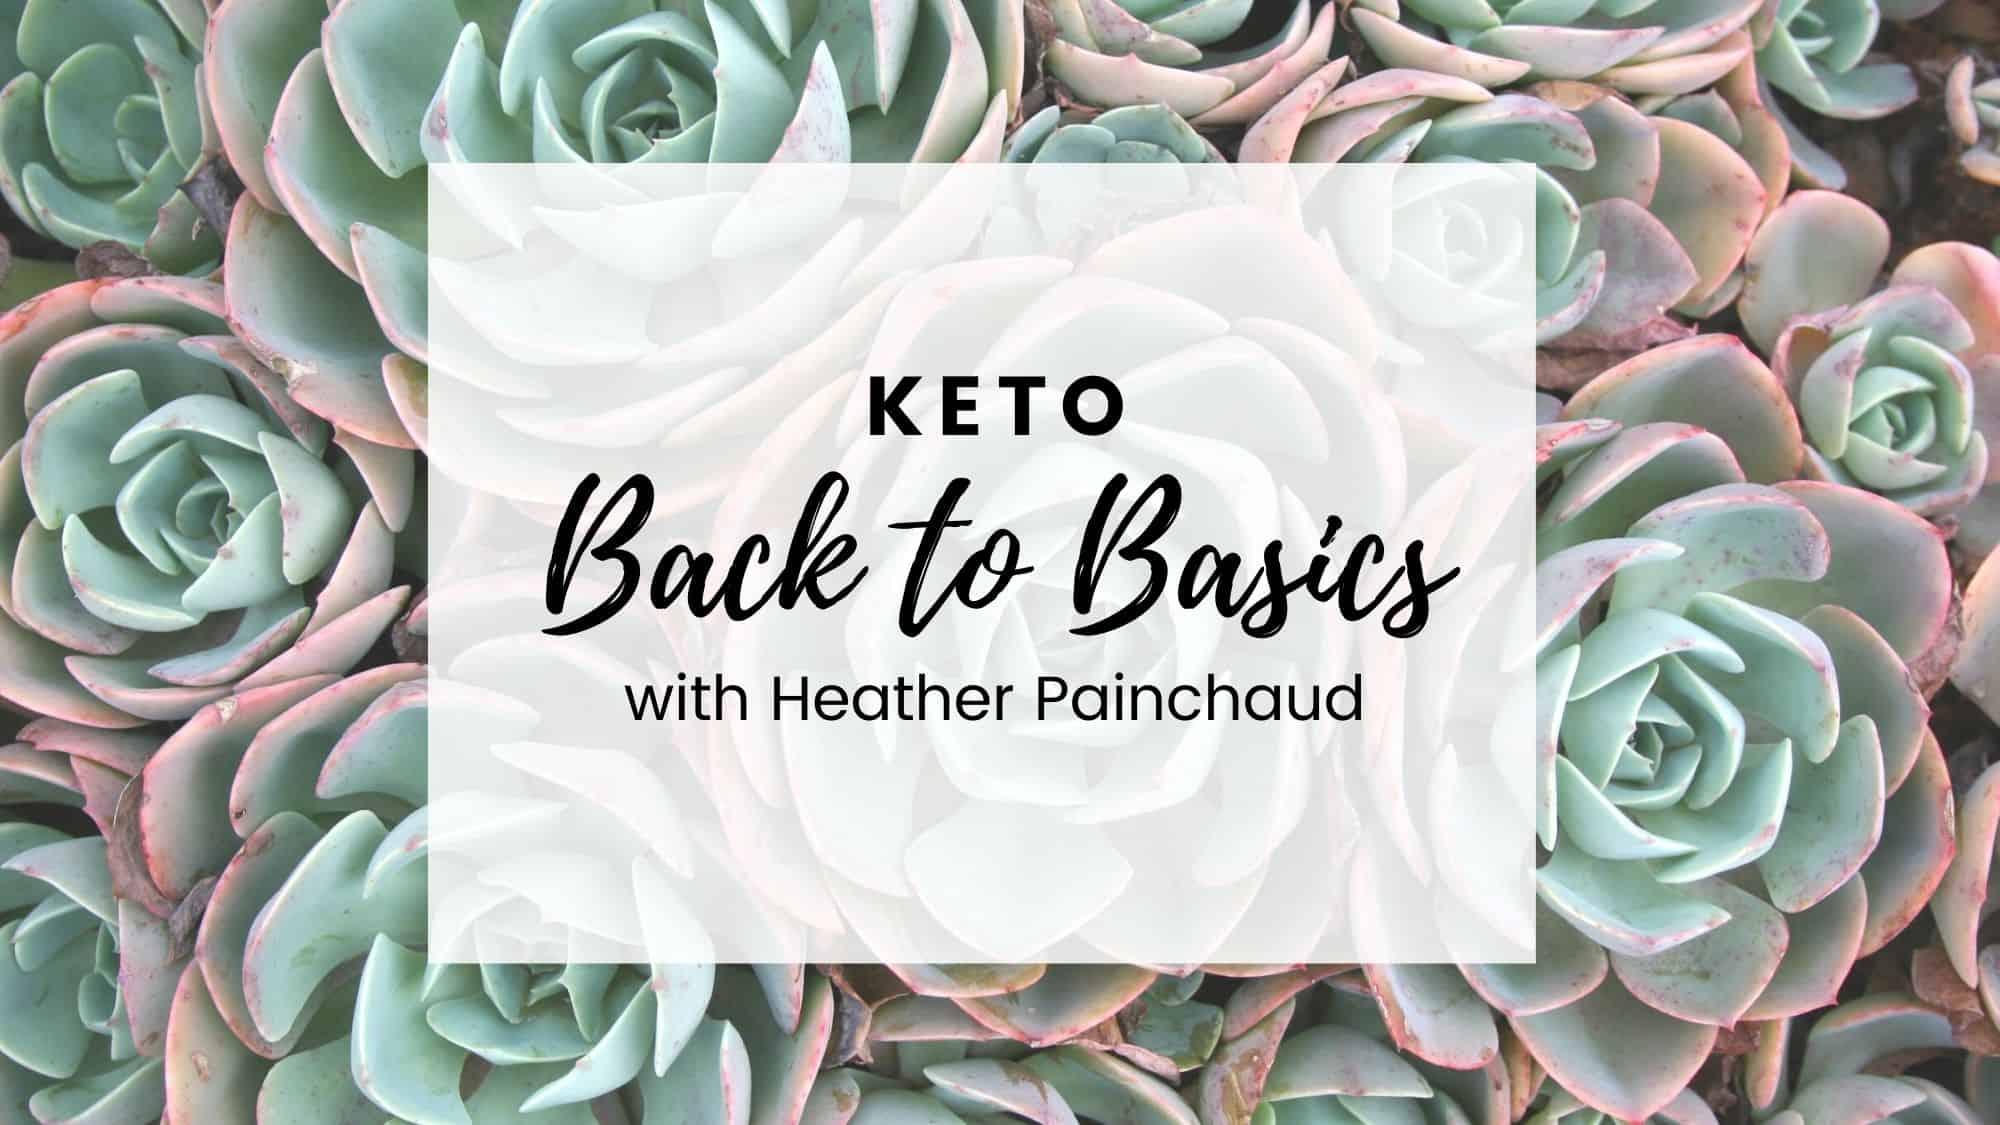 keto back to basics course